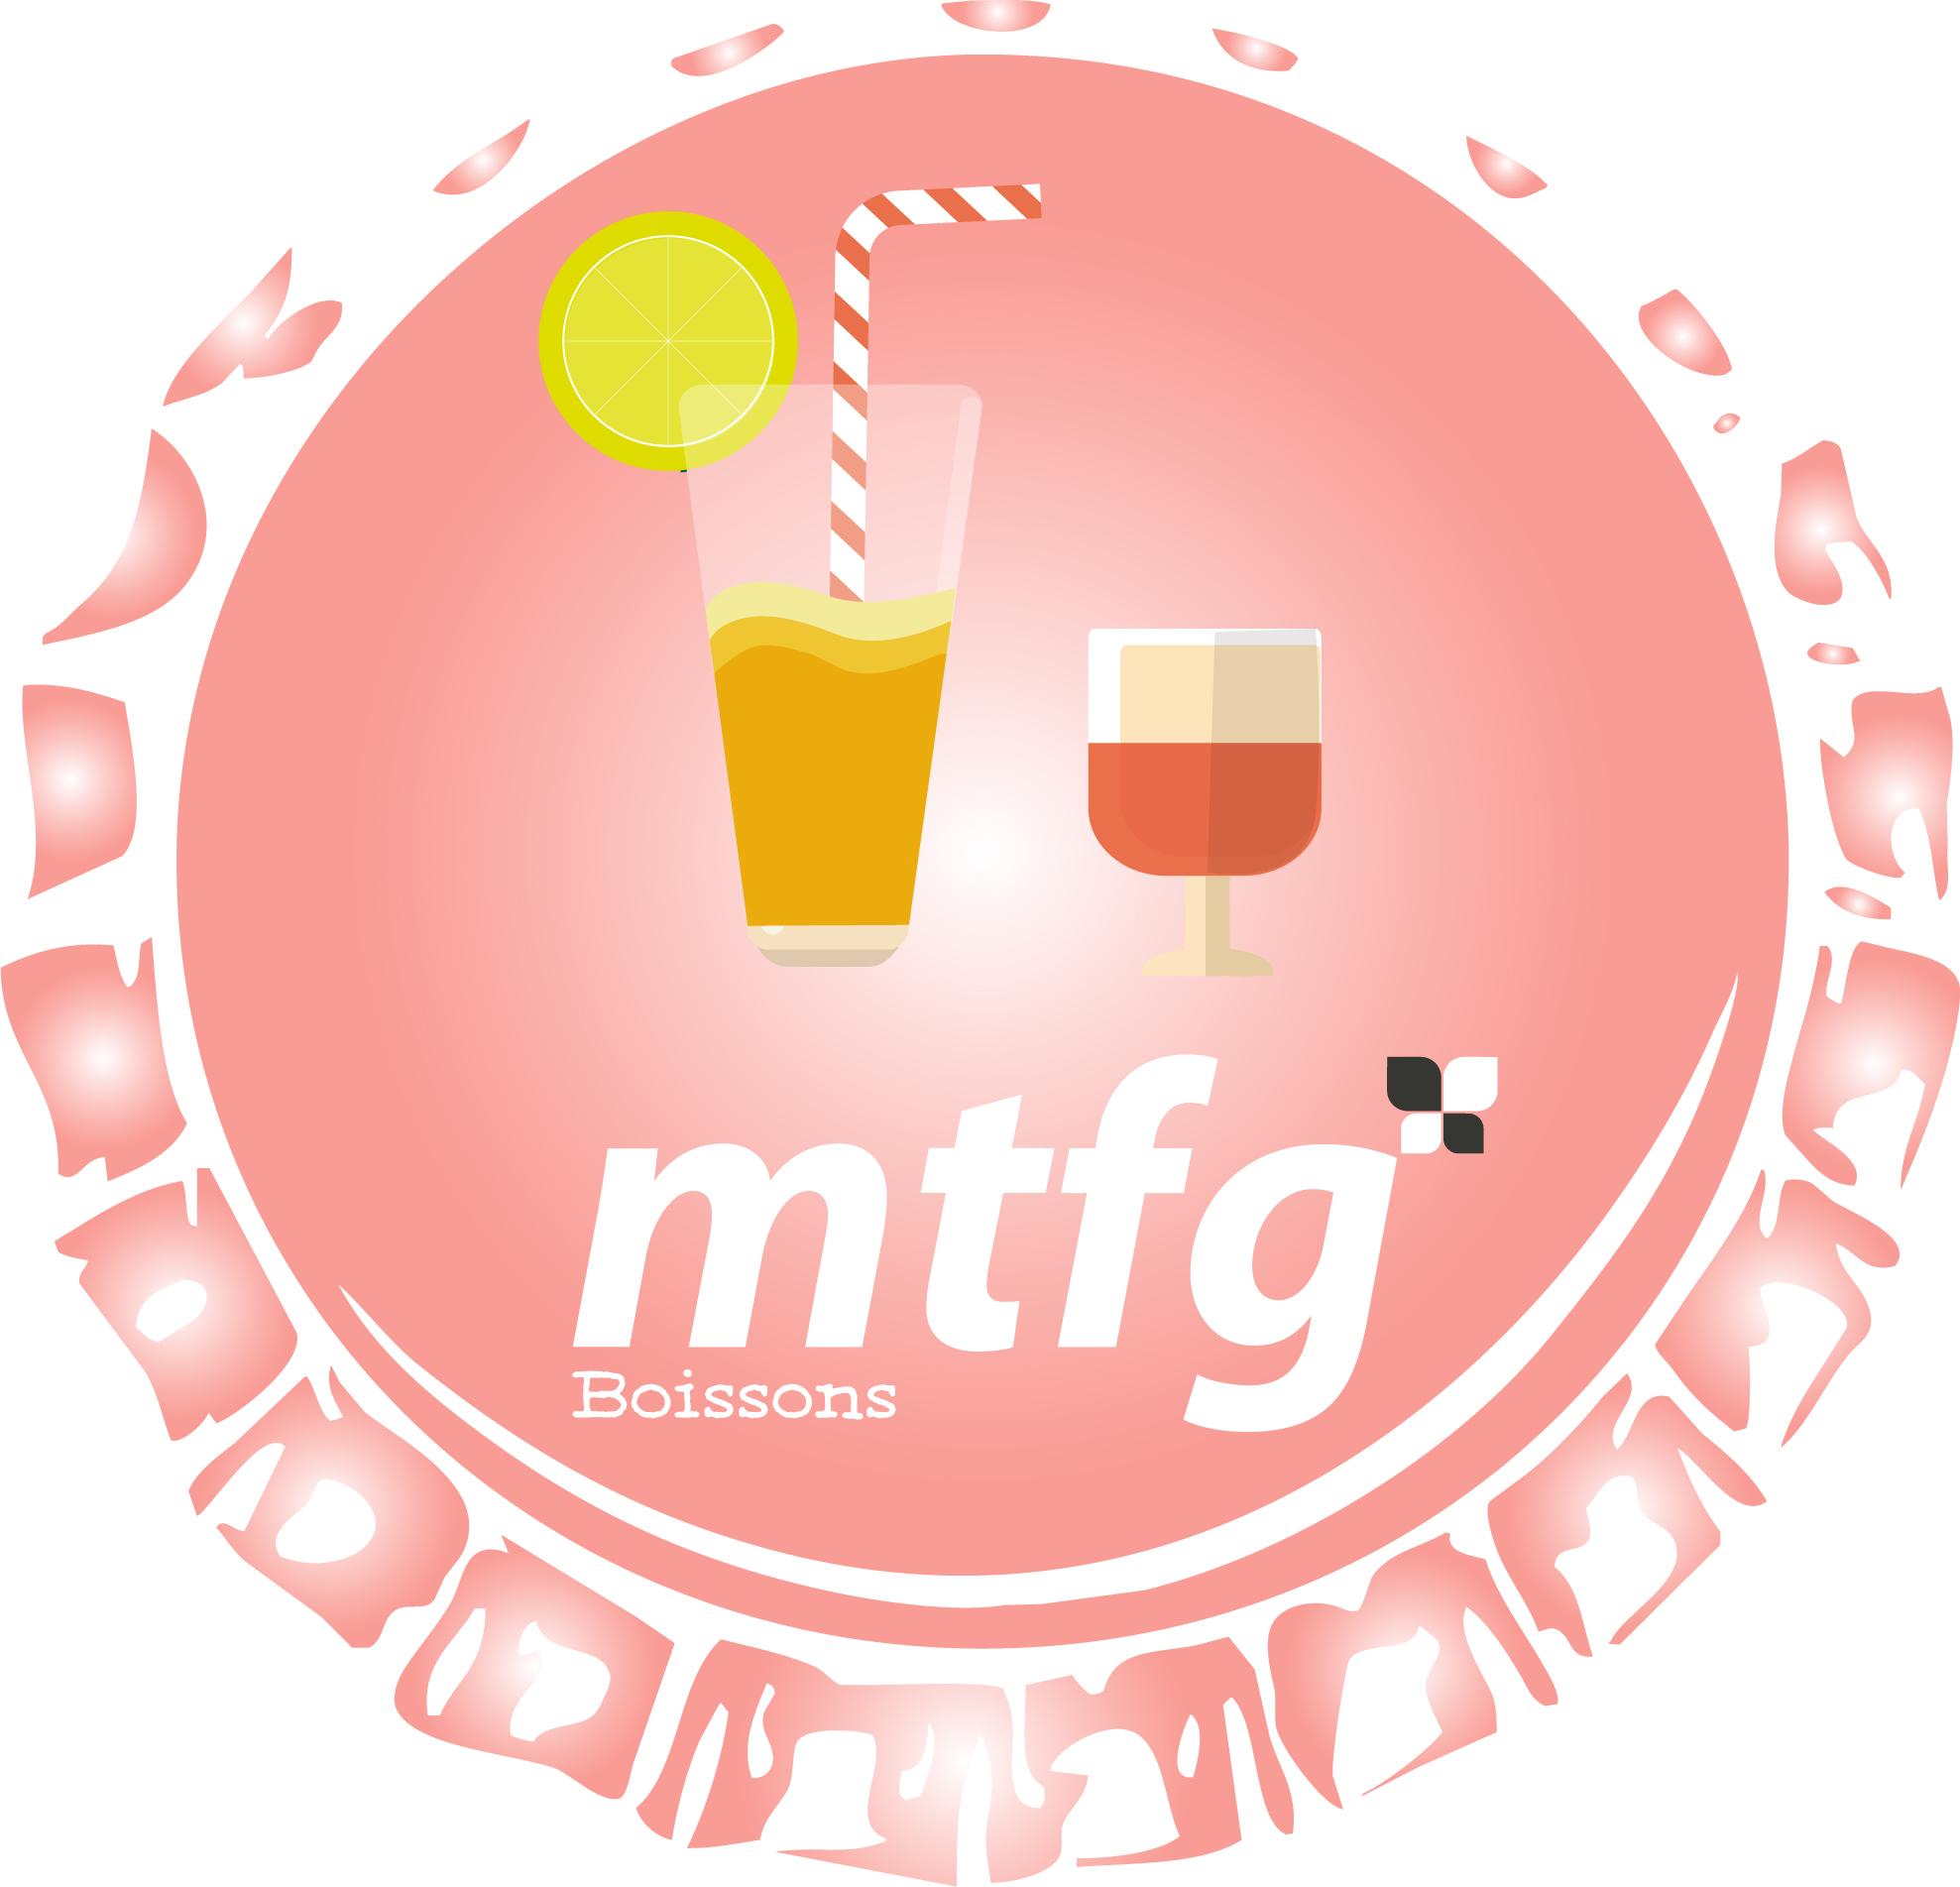 MTFG Boissons